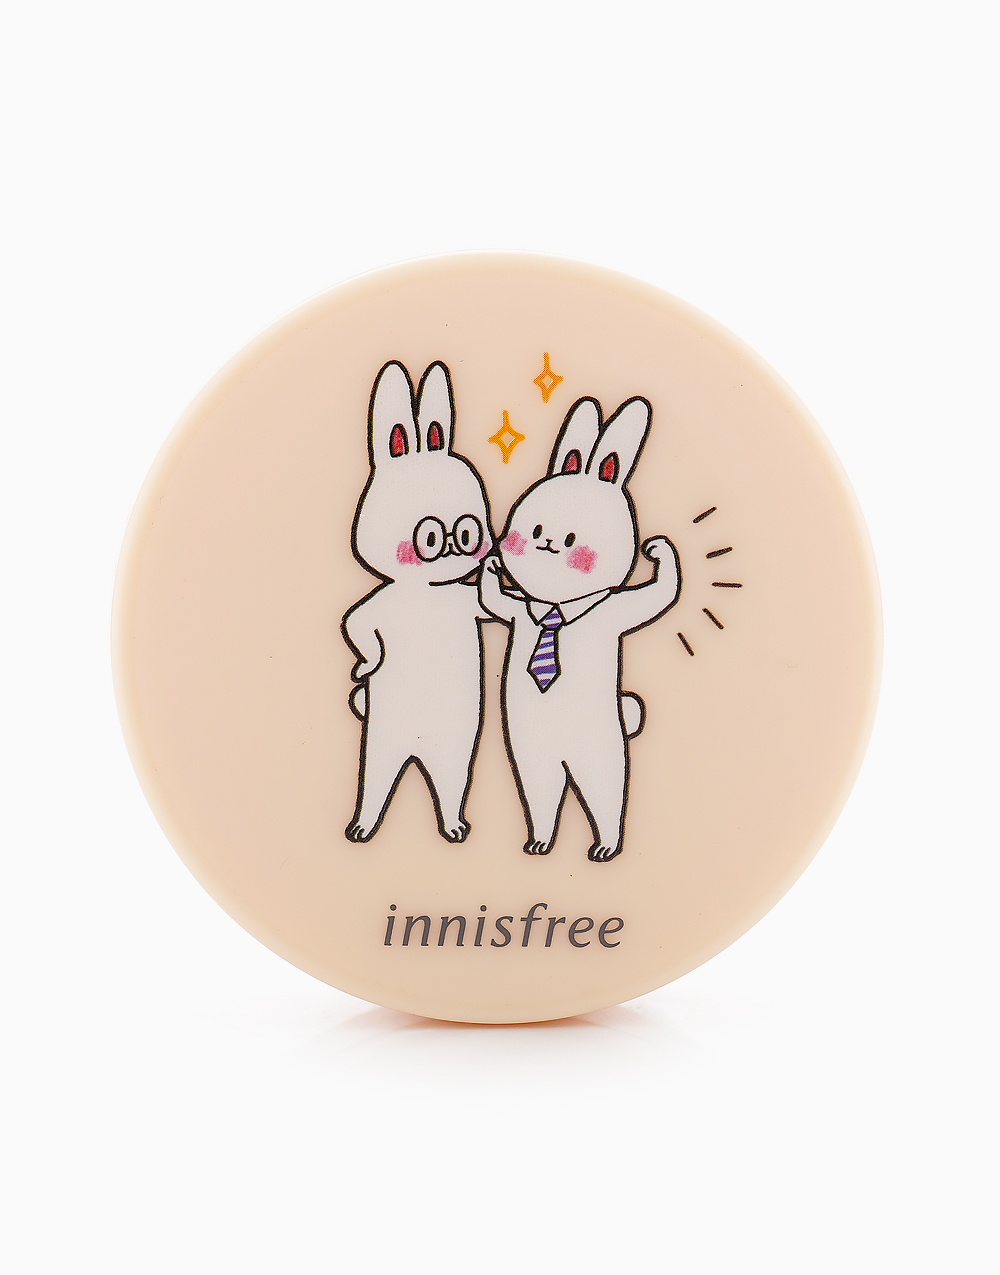 No Sebum Mineral Powder Happy Bunny Edition (5g) by Innisfree | #13 Way to Go!